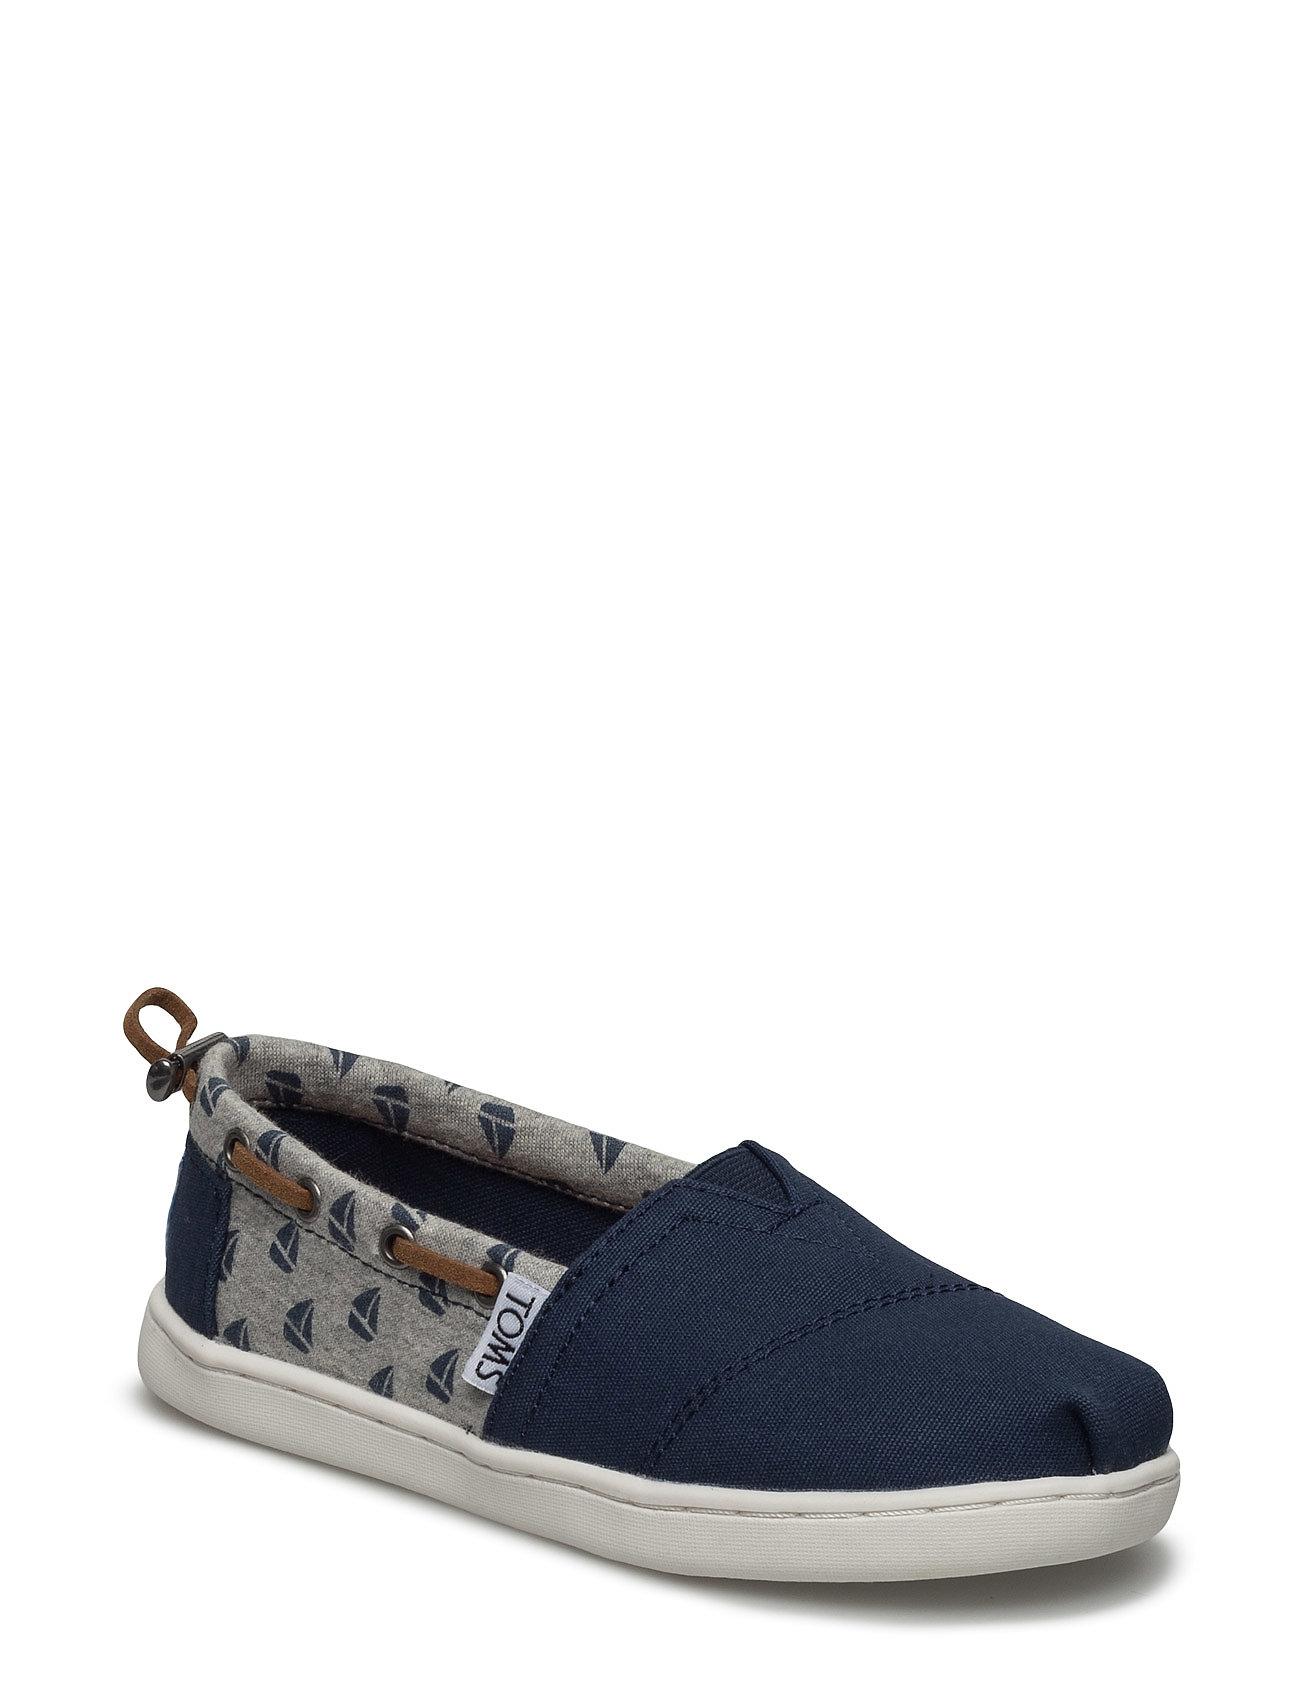 Navy Canvas/Sailboats Bimini TOMS Sko & Sneakers til Børn i